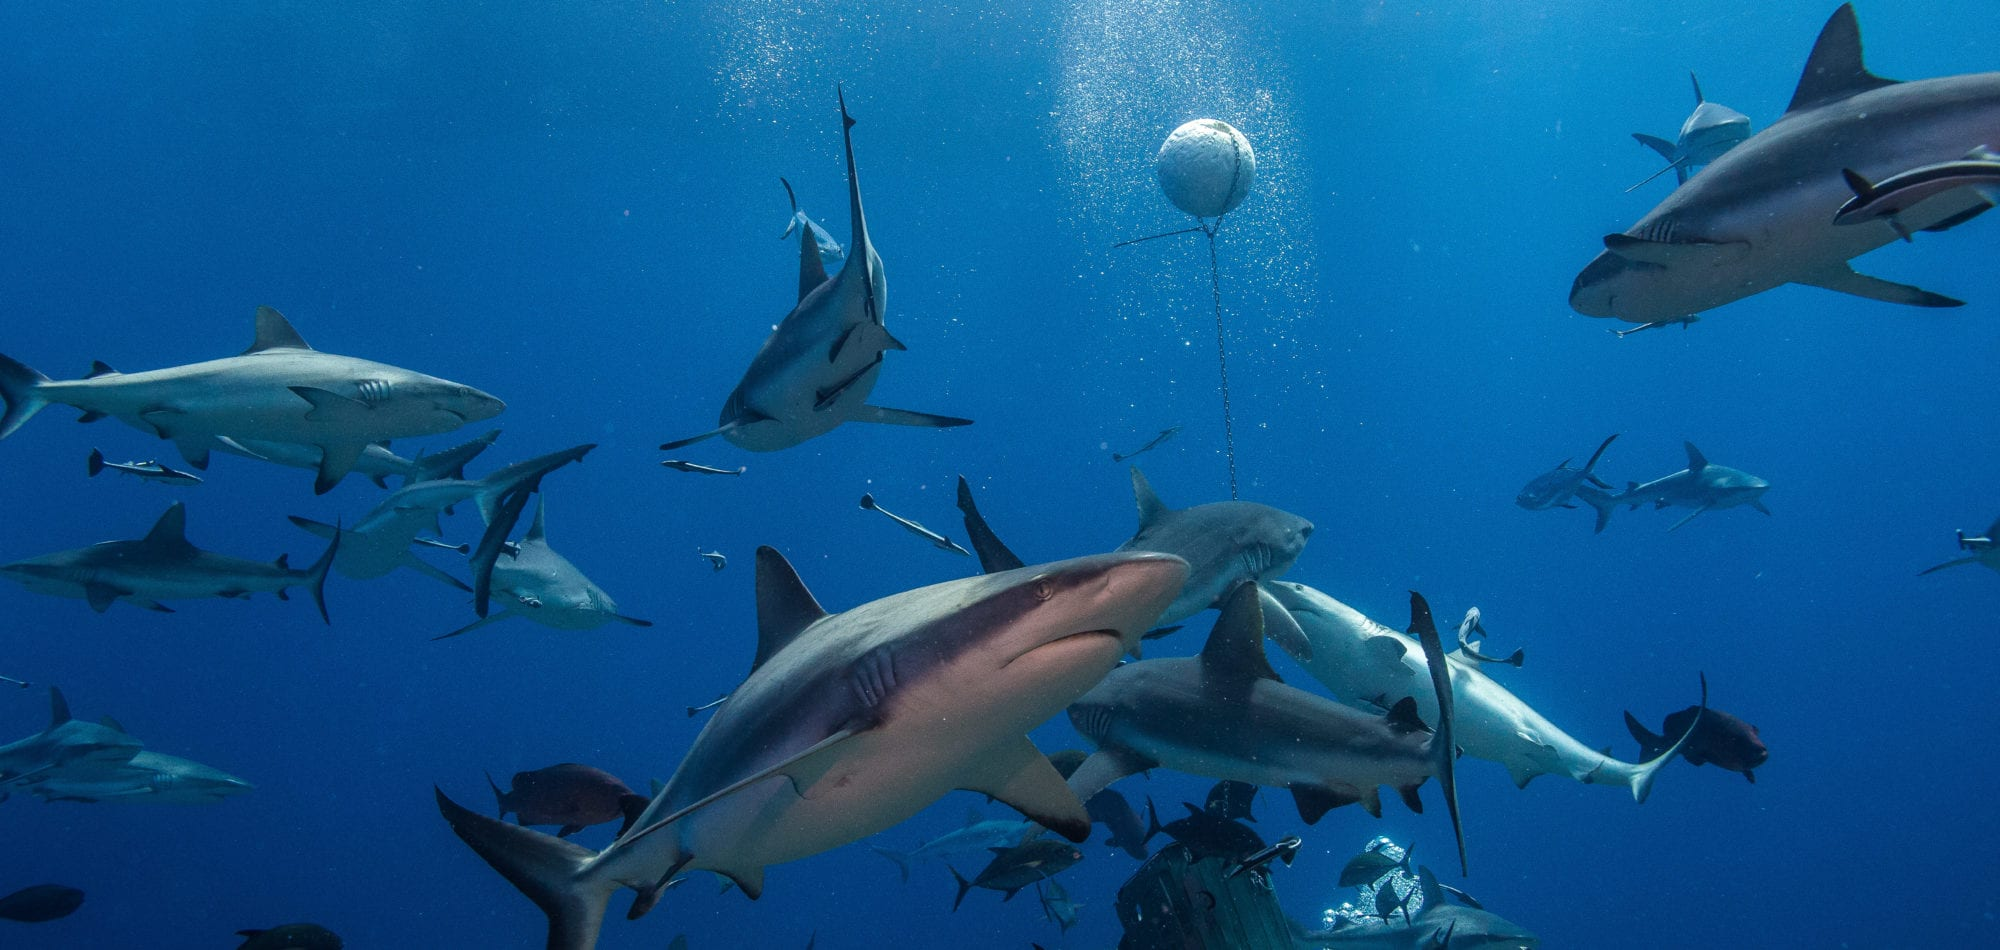 Scuba dive in Australia - Shark feeding trip in the Coral Sea